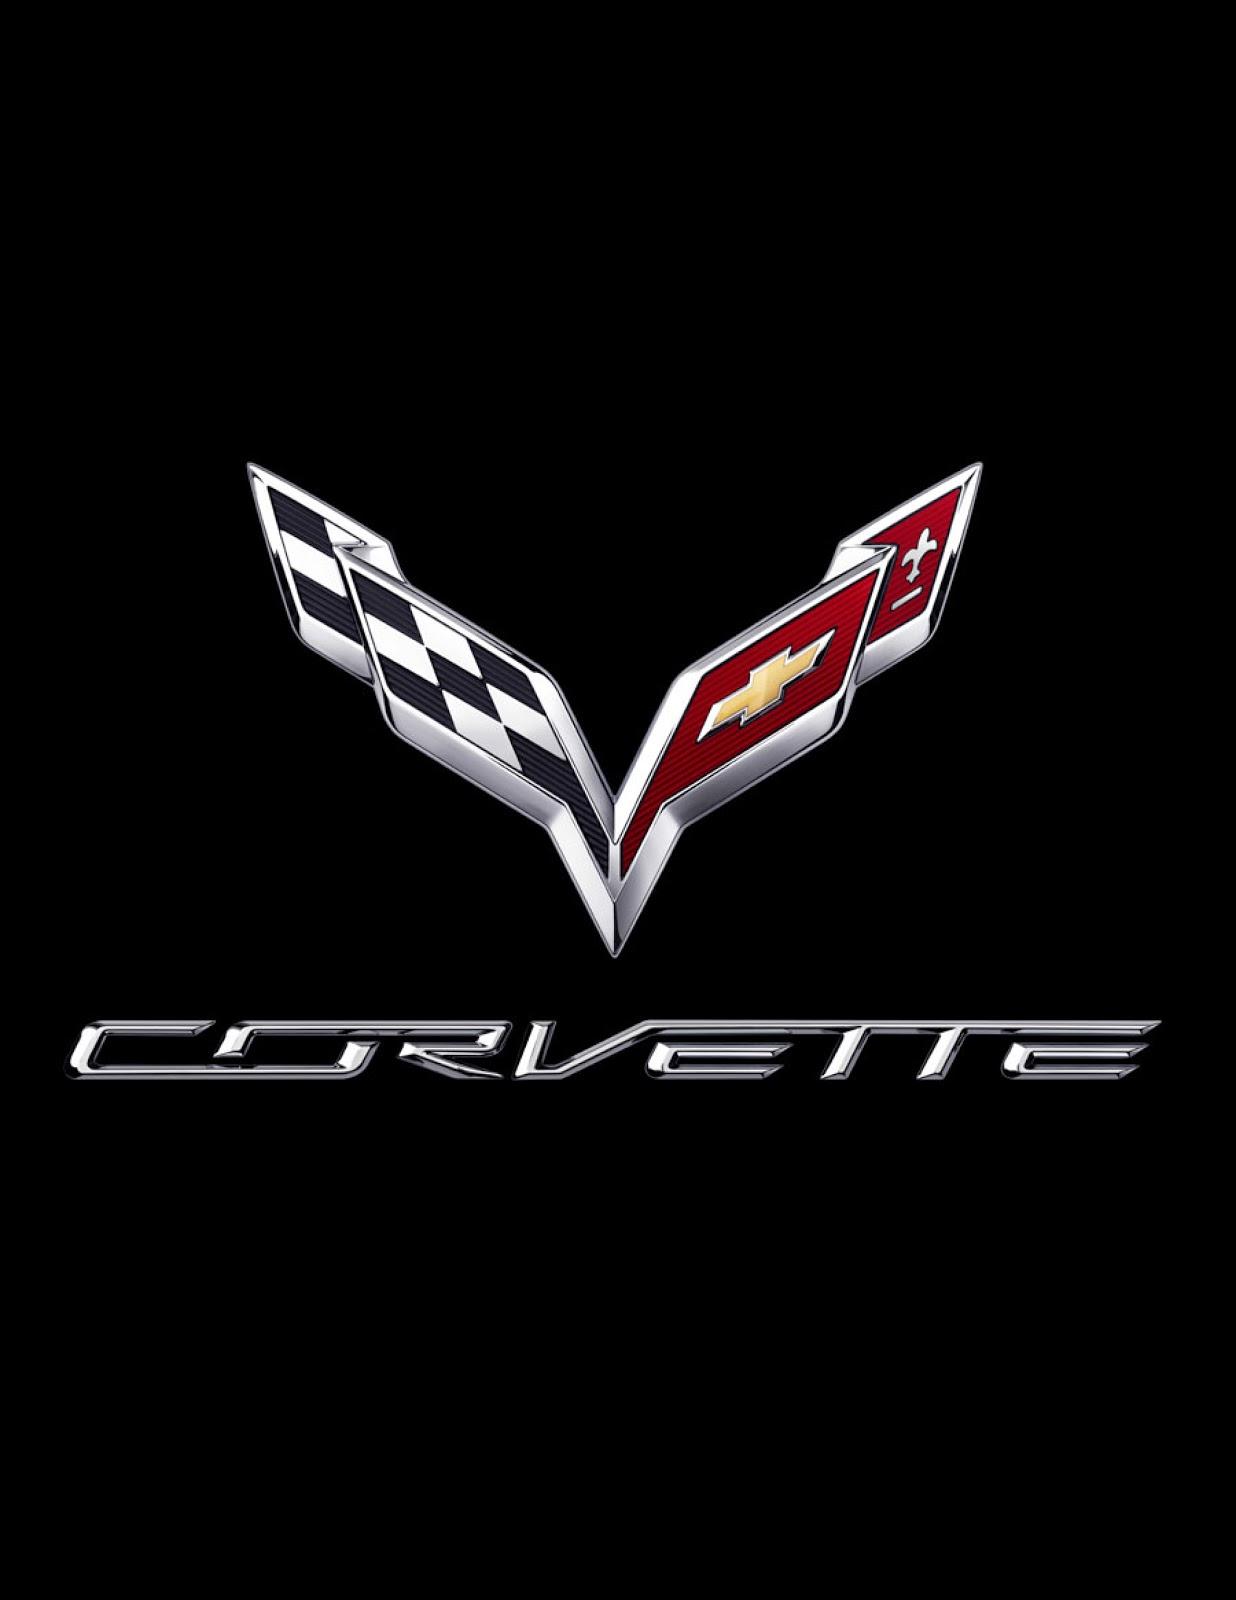 National Corvette Museum: Next-generation Corvette to ...